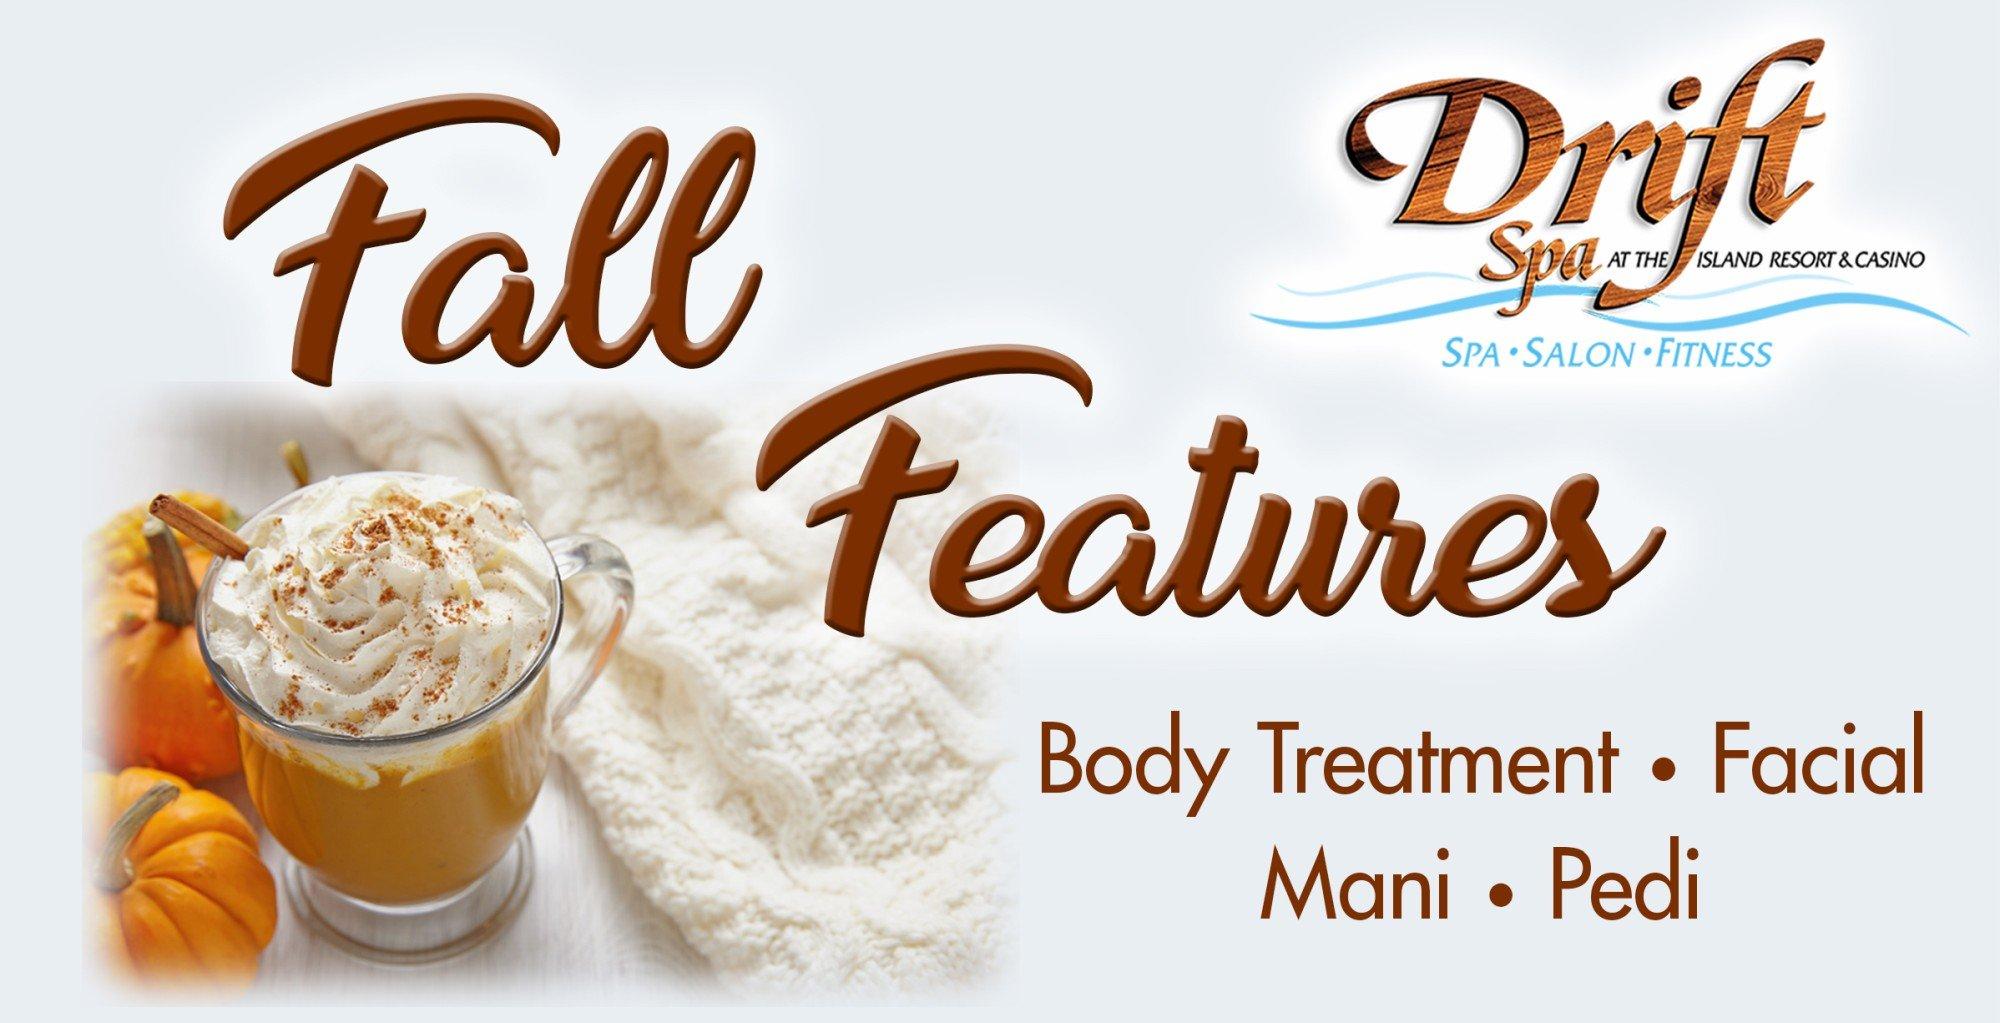 Fall Treatment Specials at Drift Spa.